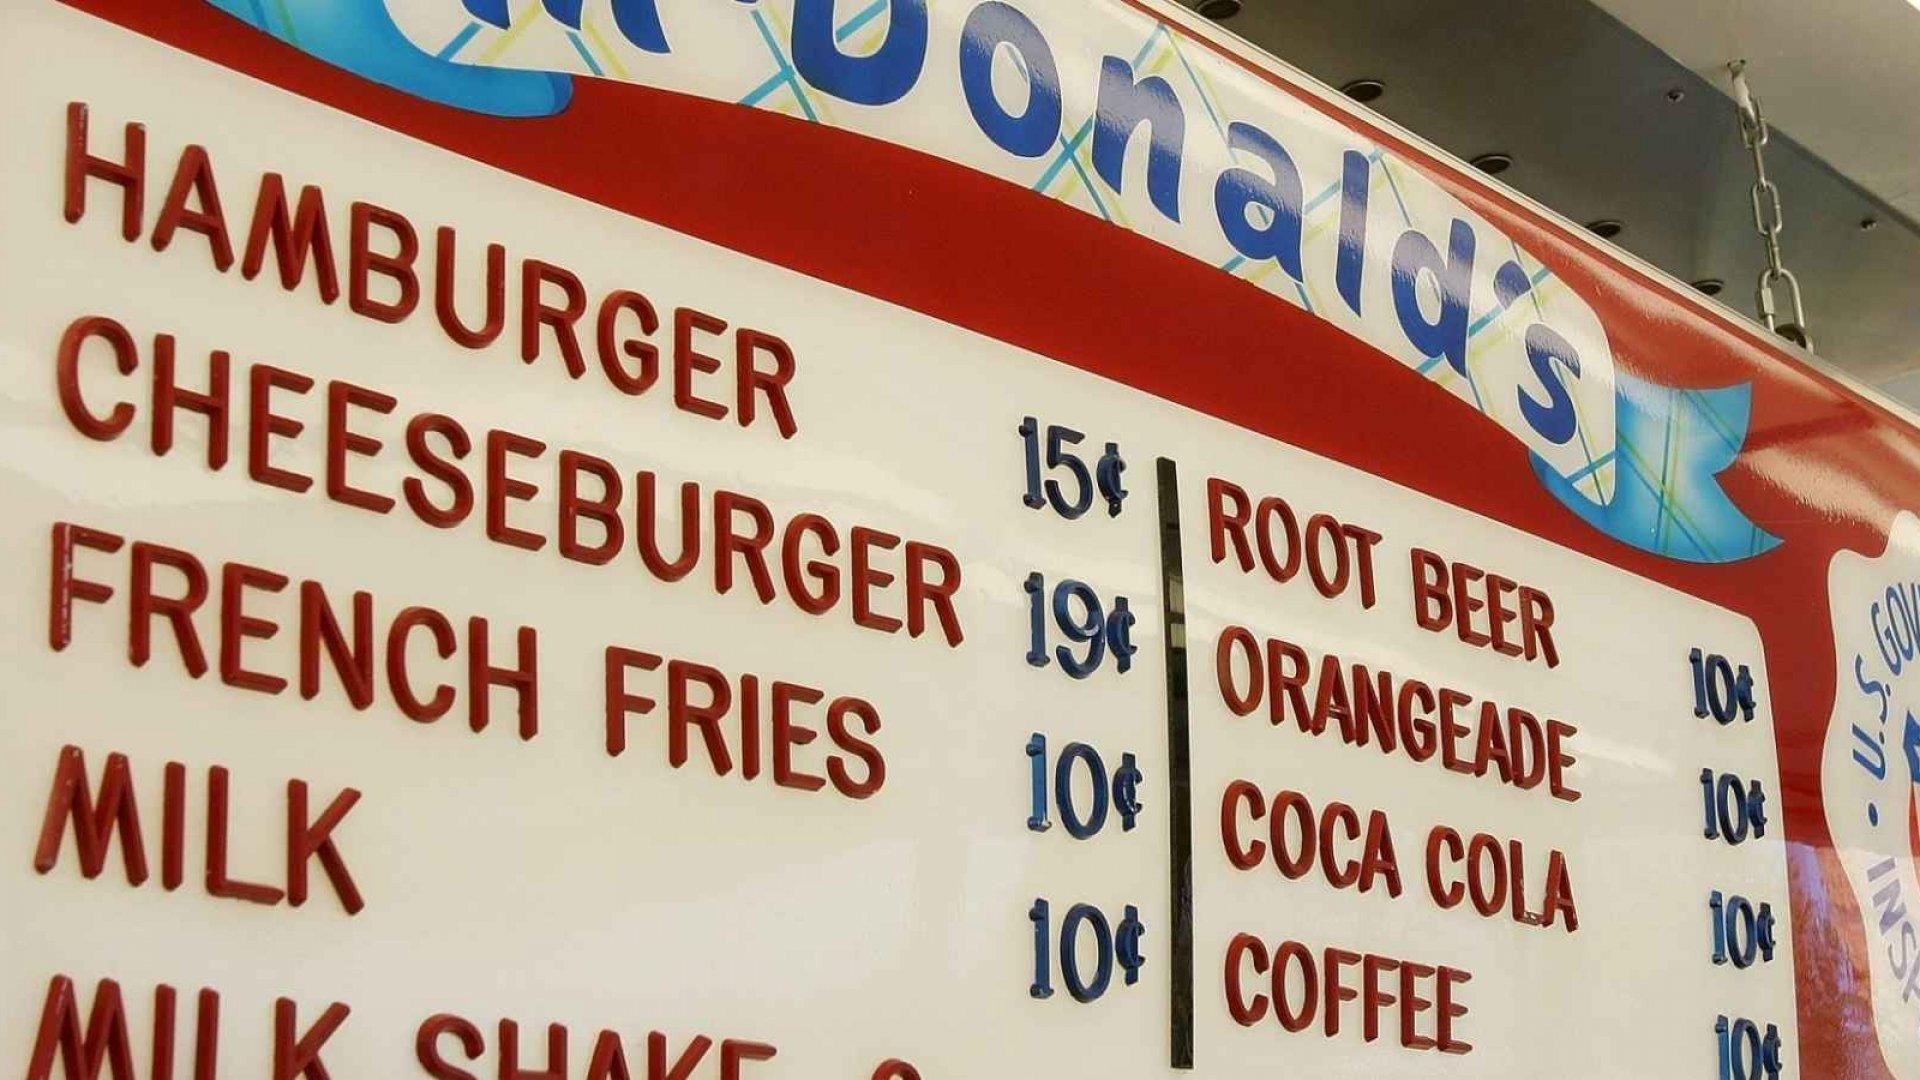 Burgers, Milkshakes and Michael Keaton: The McDonad's Movie Is Coming